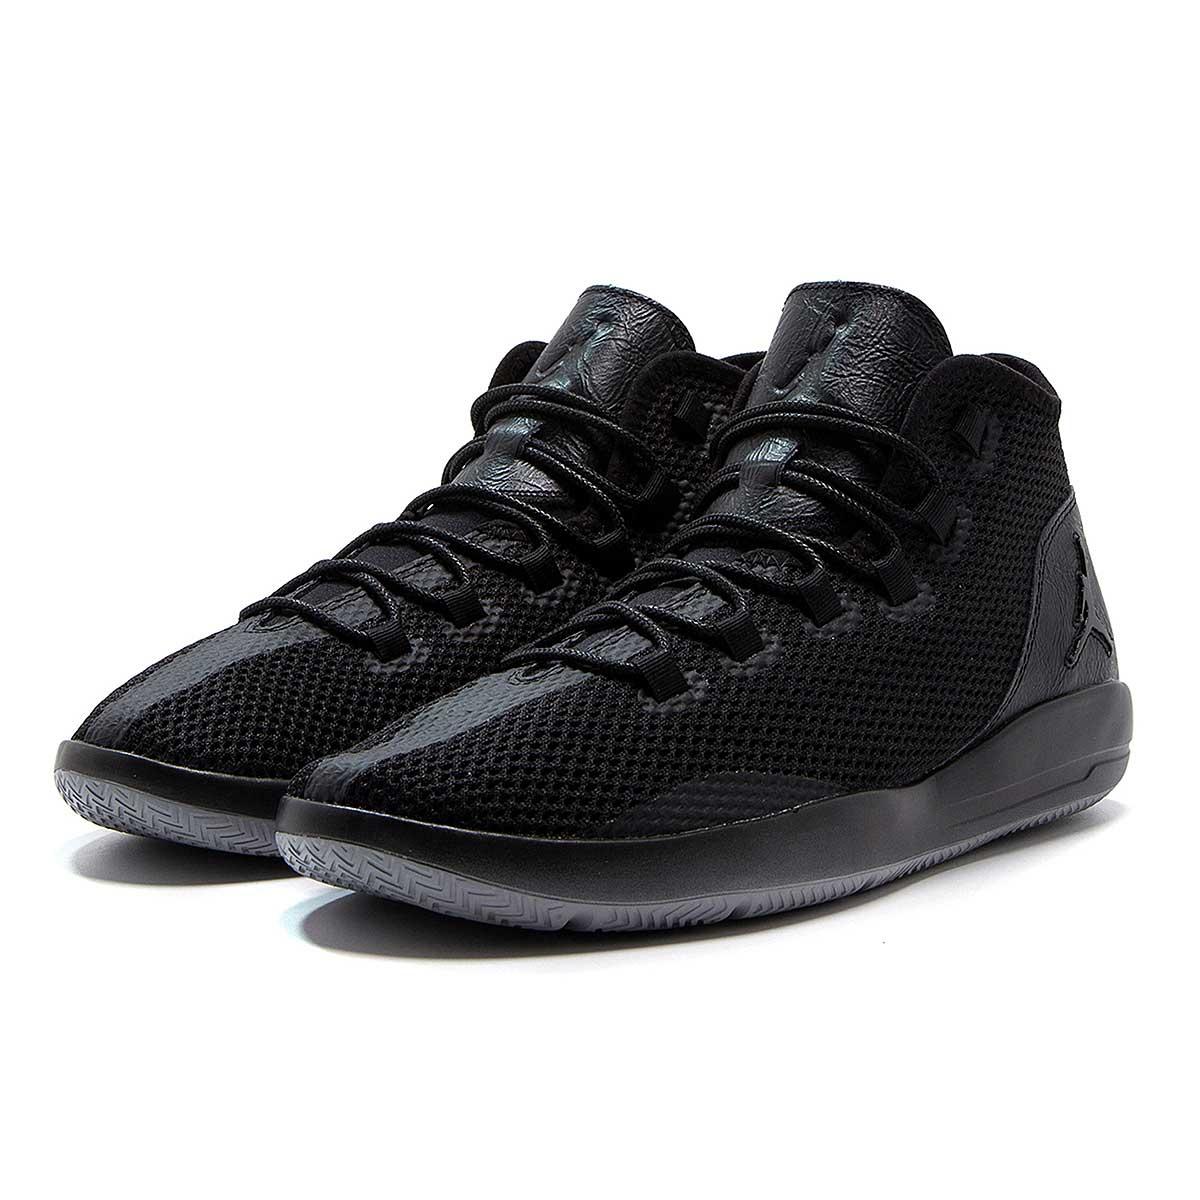 Nike Jordan Reveal Premium [KICKZ]